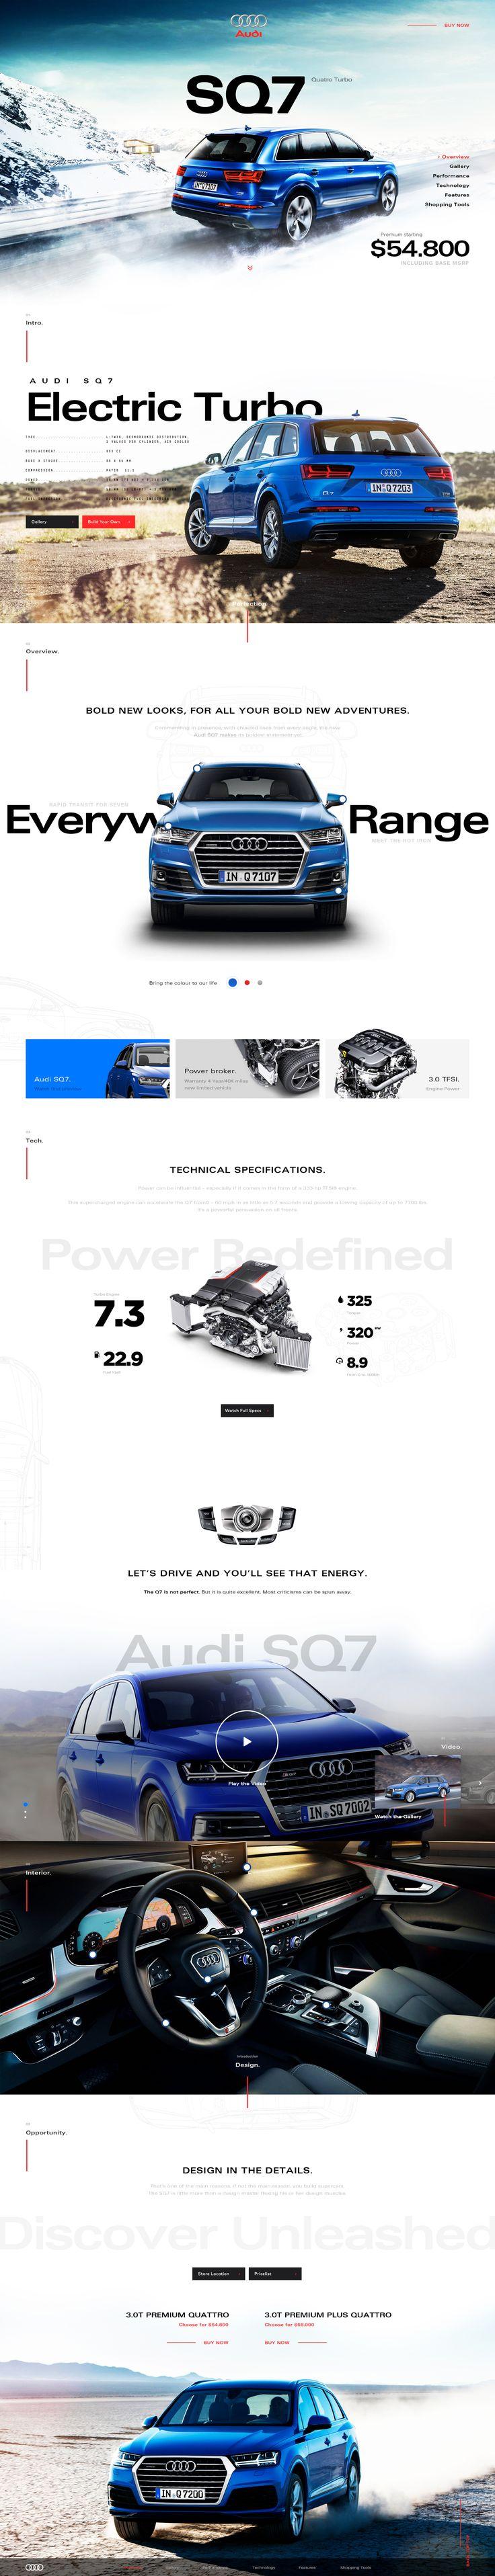 Automotive web websiste inspiration design